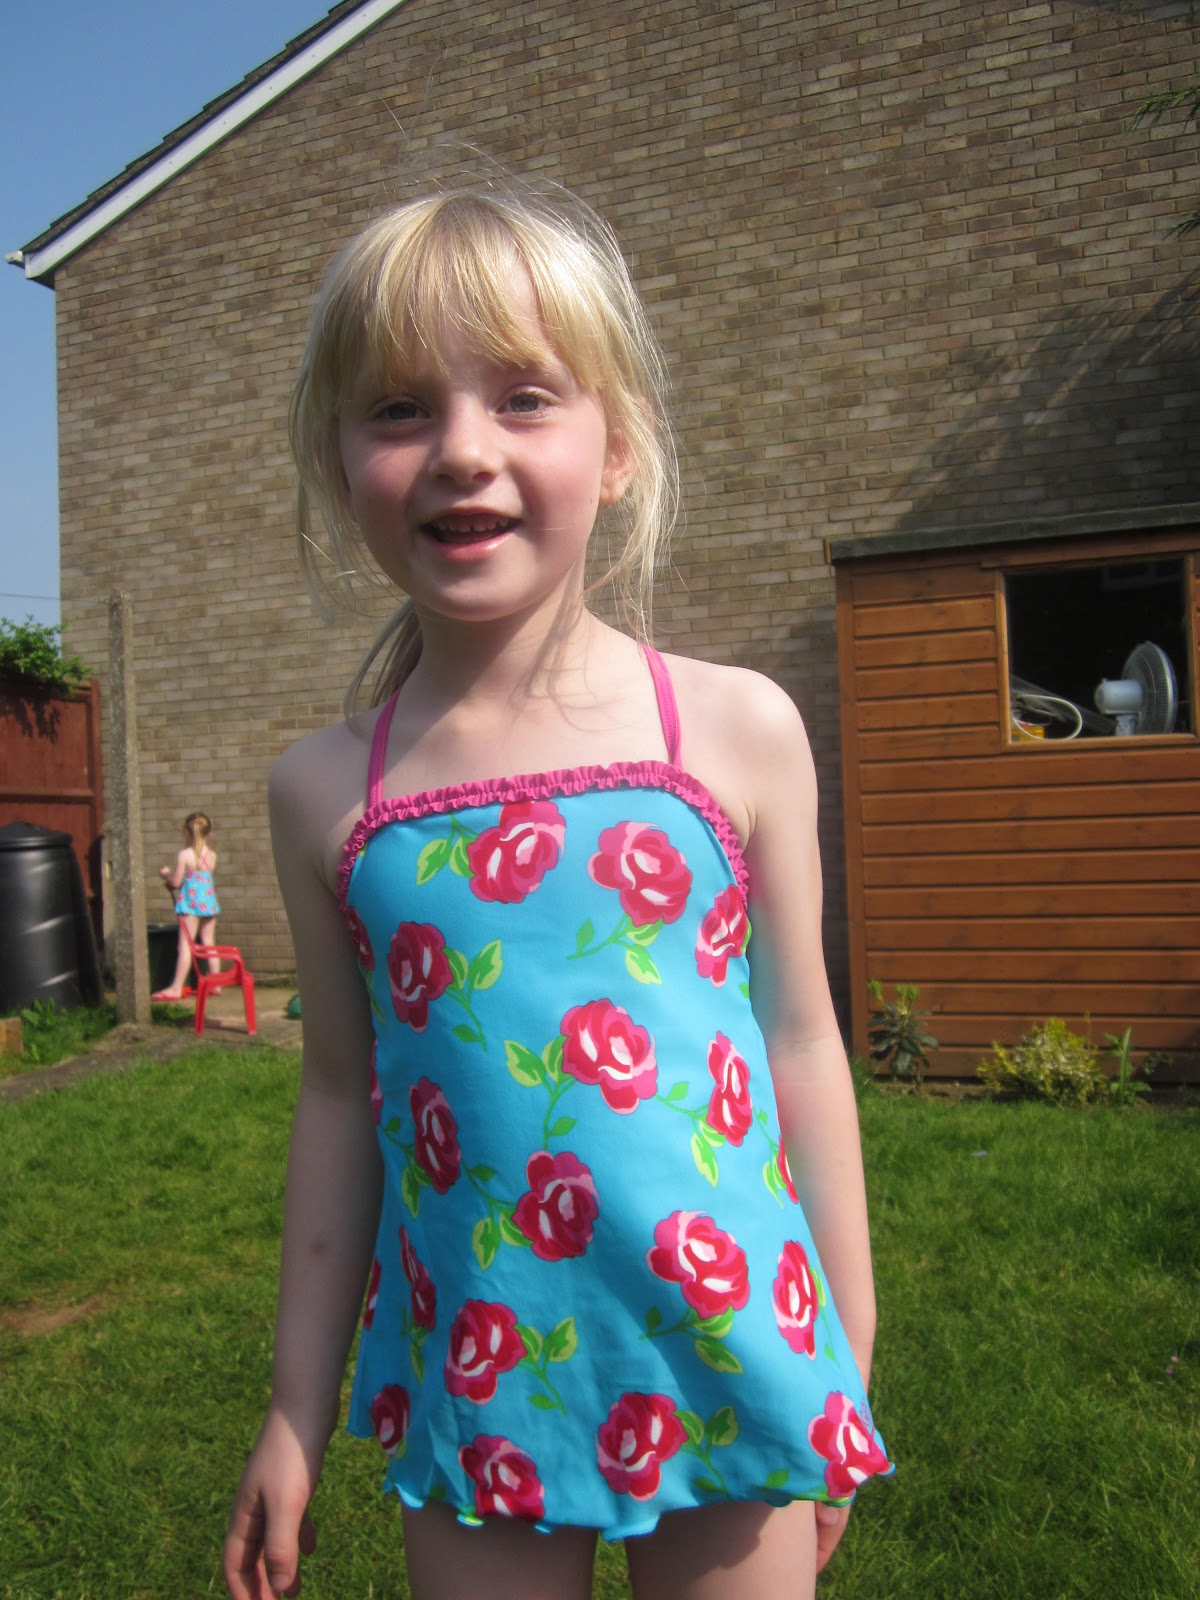 Naked 8 year old girls photos 27